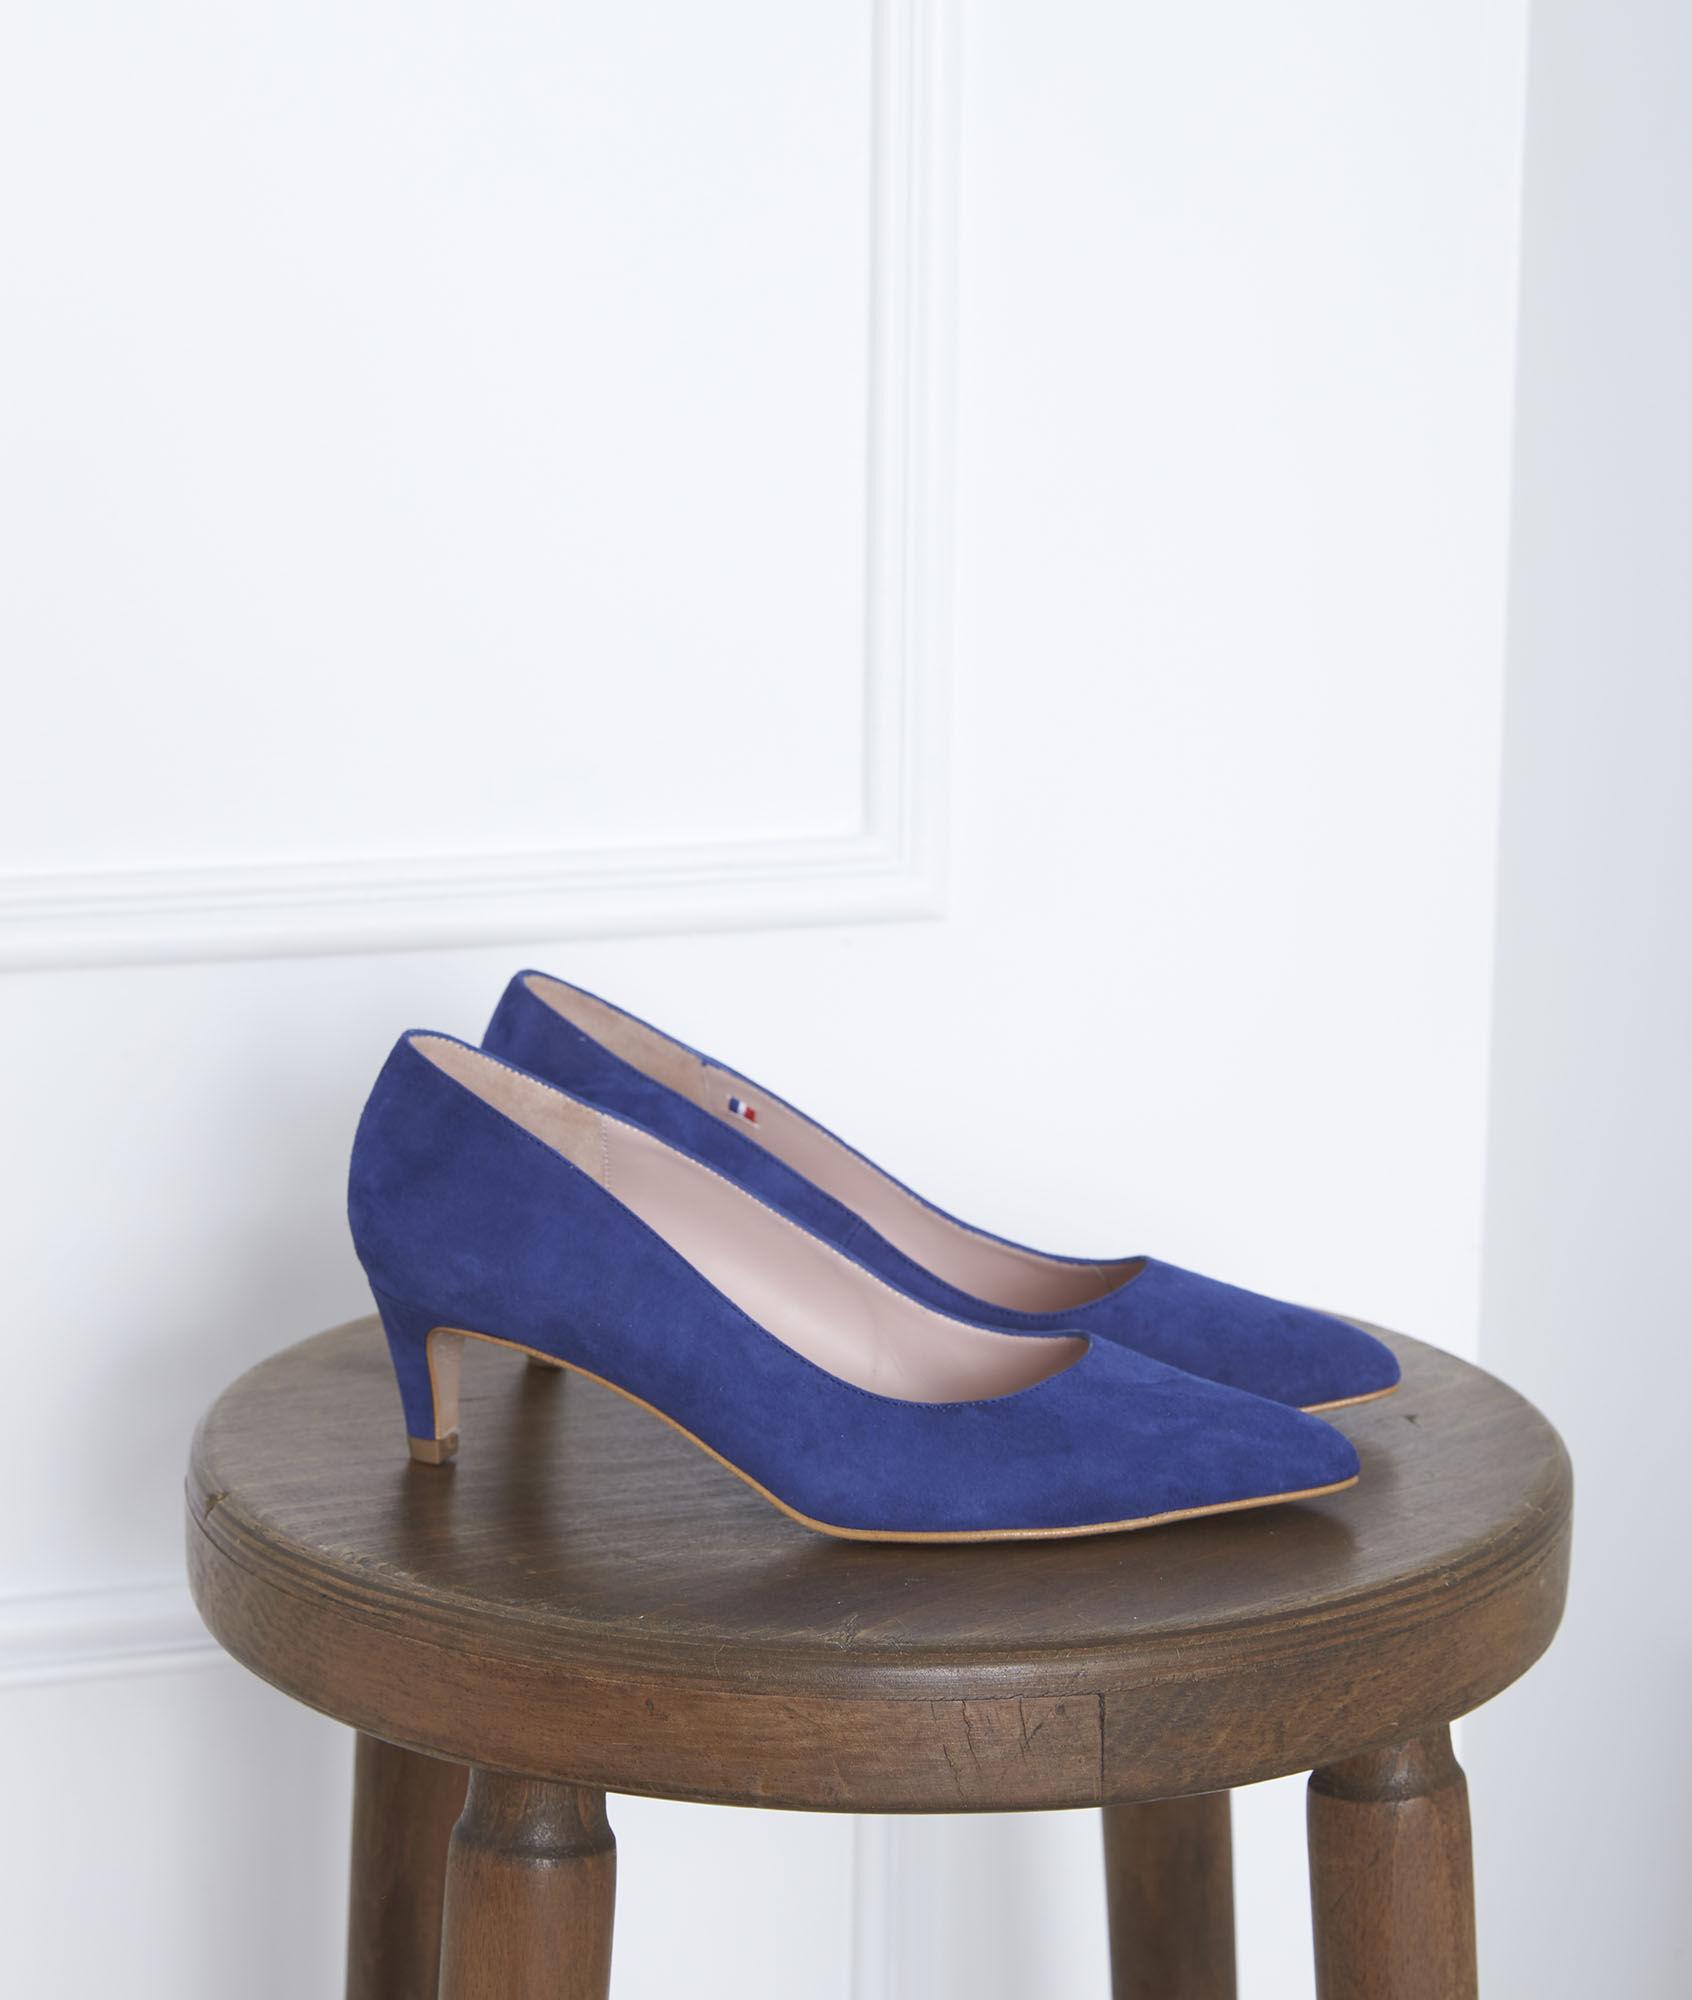 Ziegenveloursleder Blaue Pumps Blaue aus Lili PuTkOwXZi